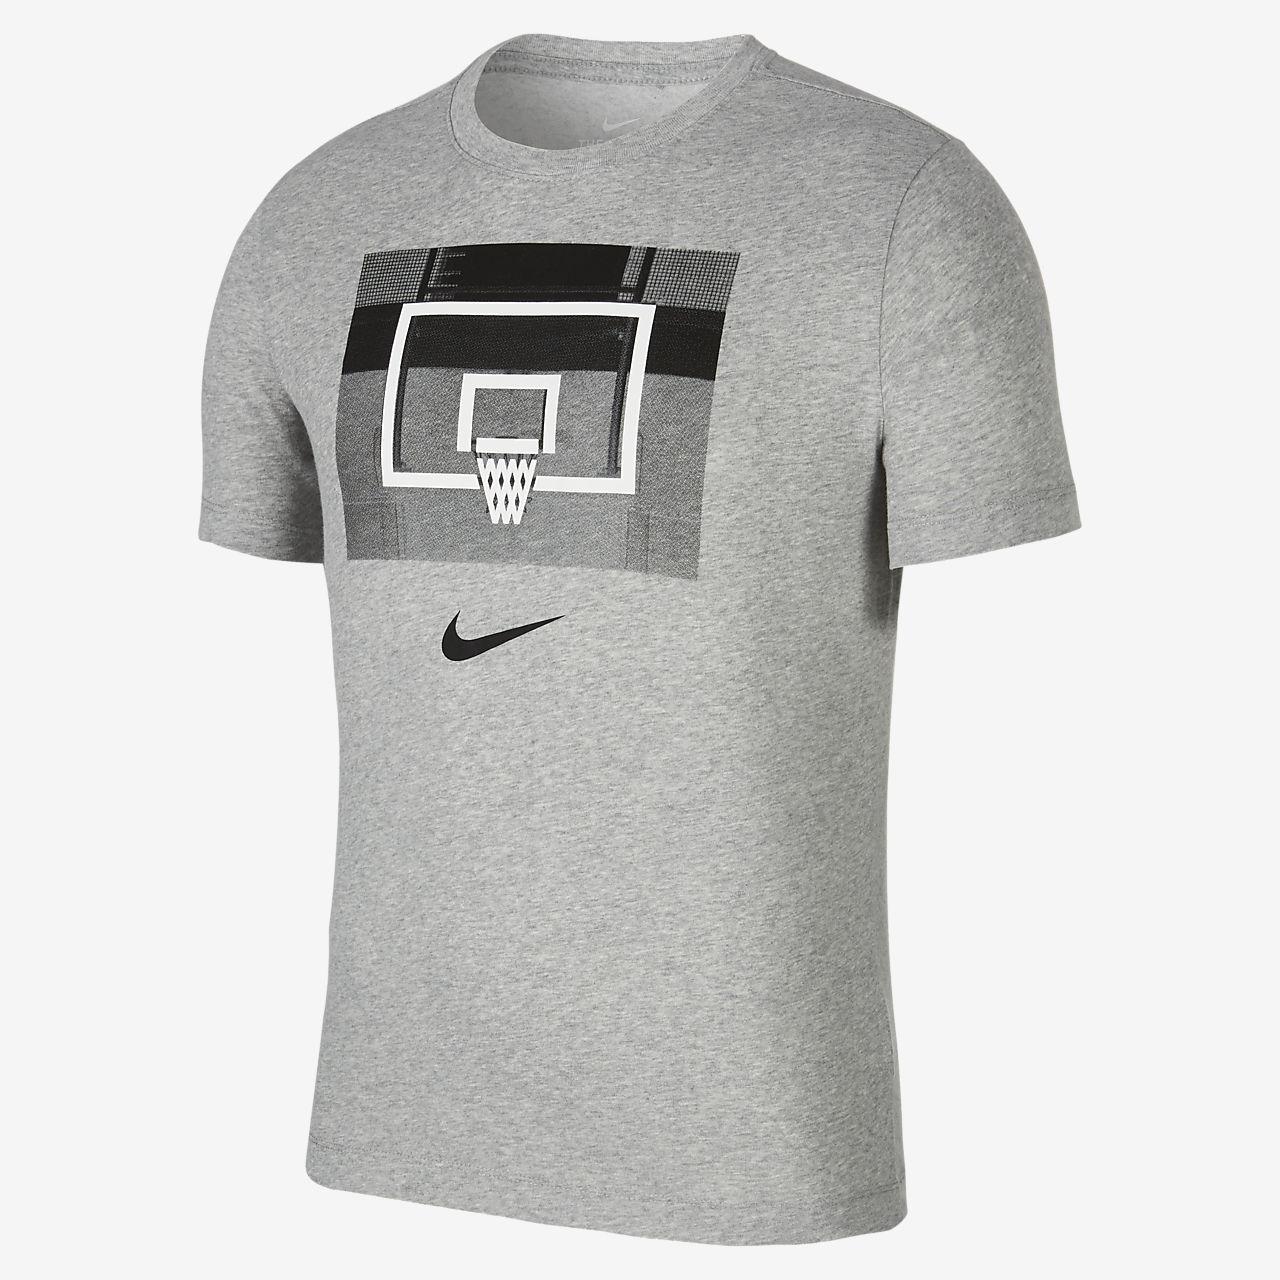 e706657b327d Nike Dri-FIT Men s Basketball T-Shirt. Nike.com IN